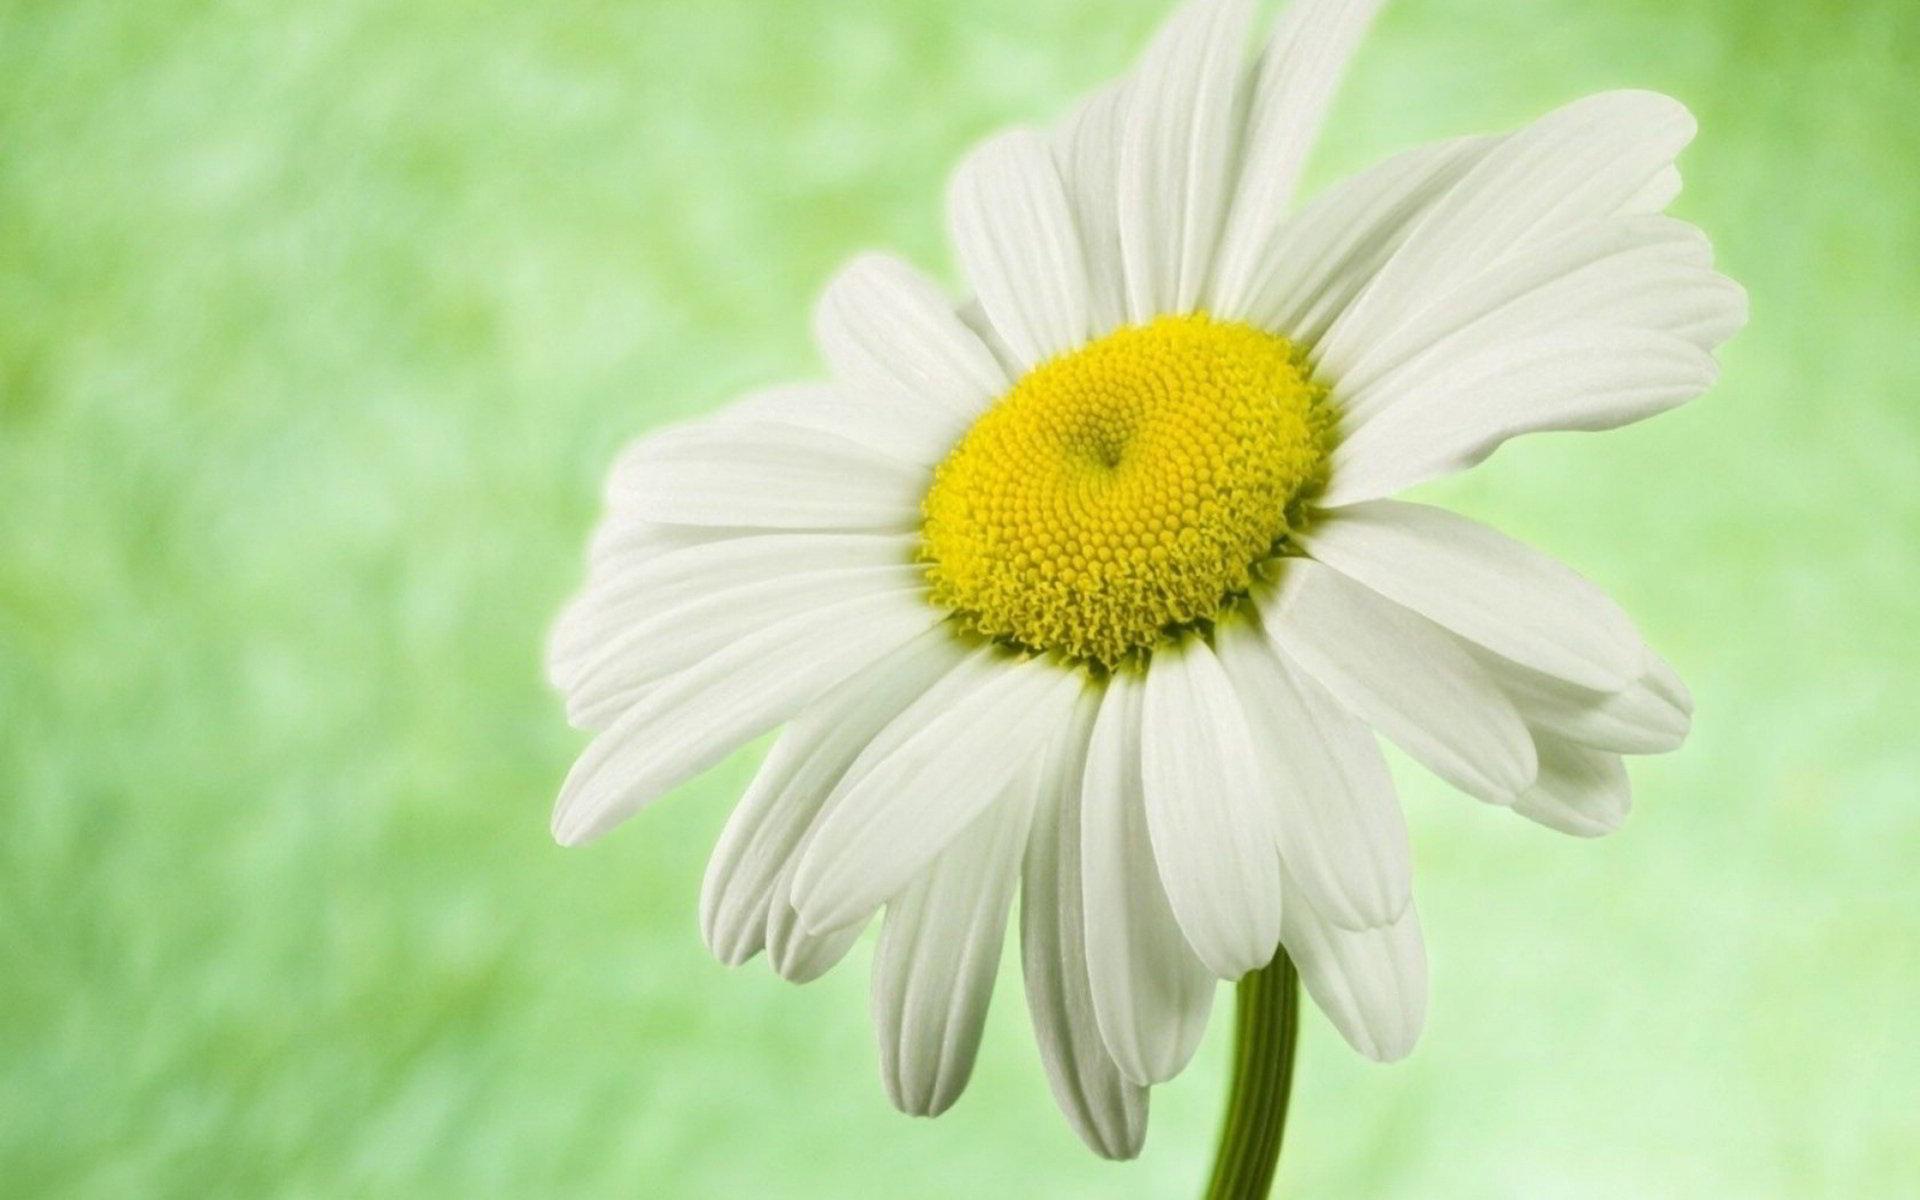 hinh anh hoa cuc dep 51